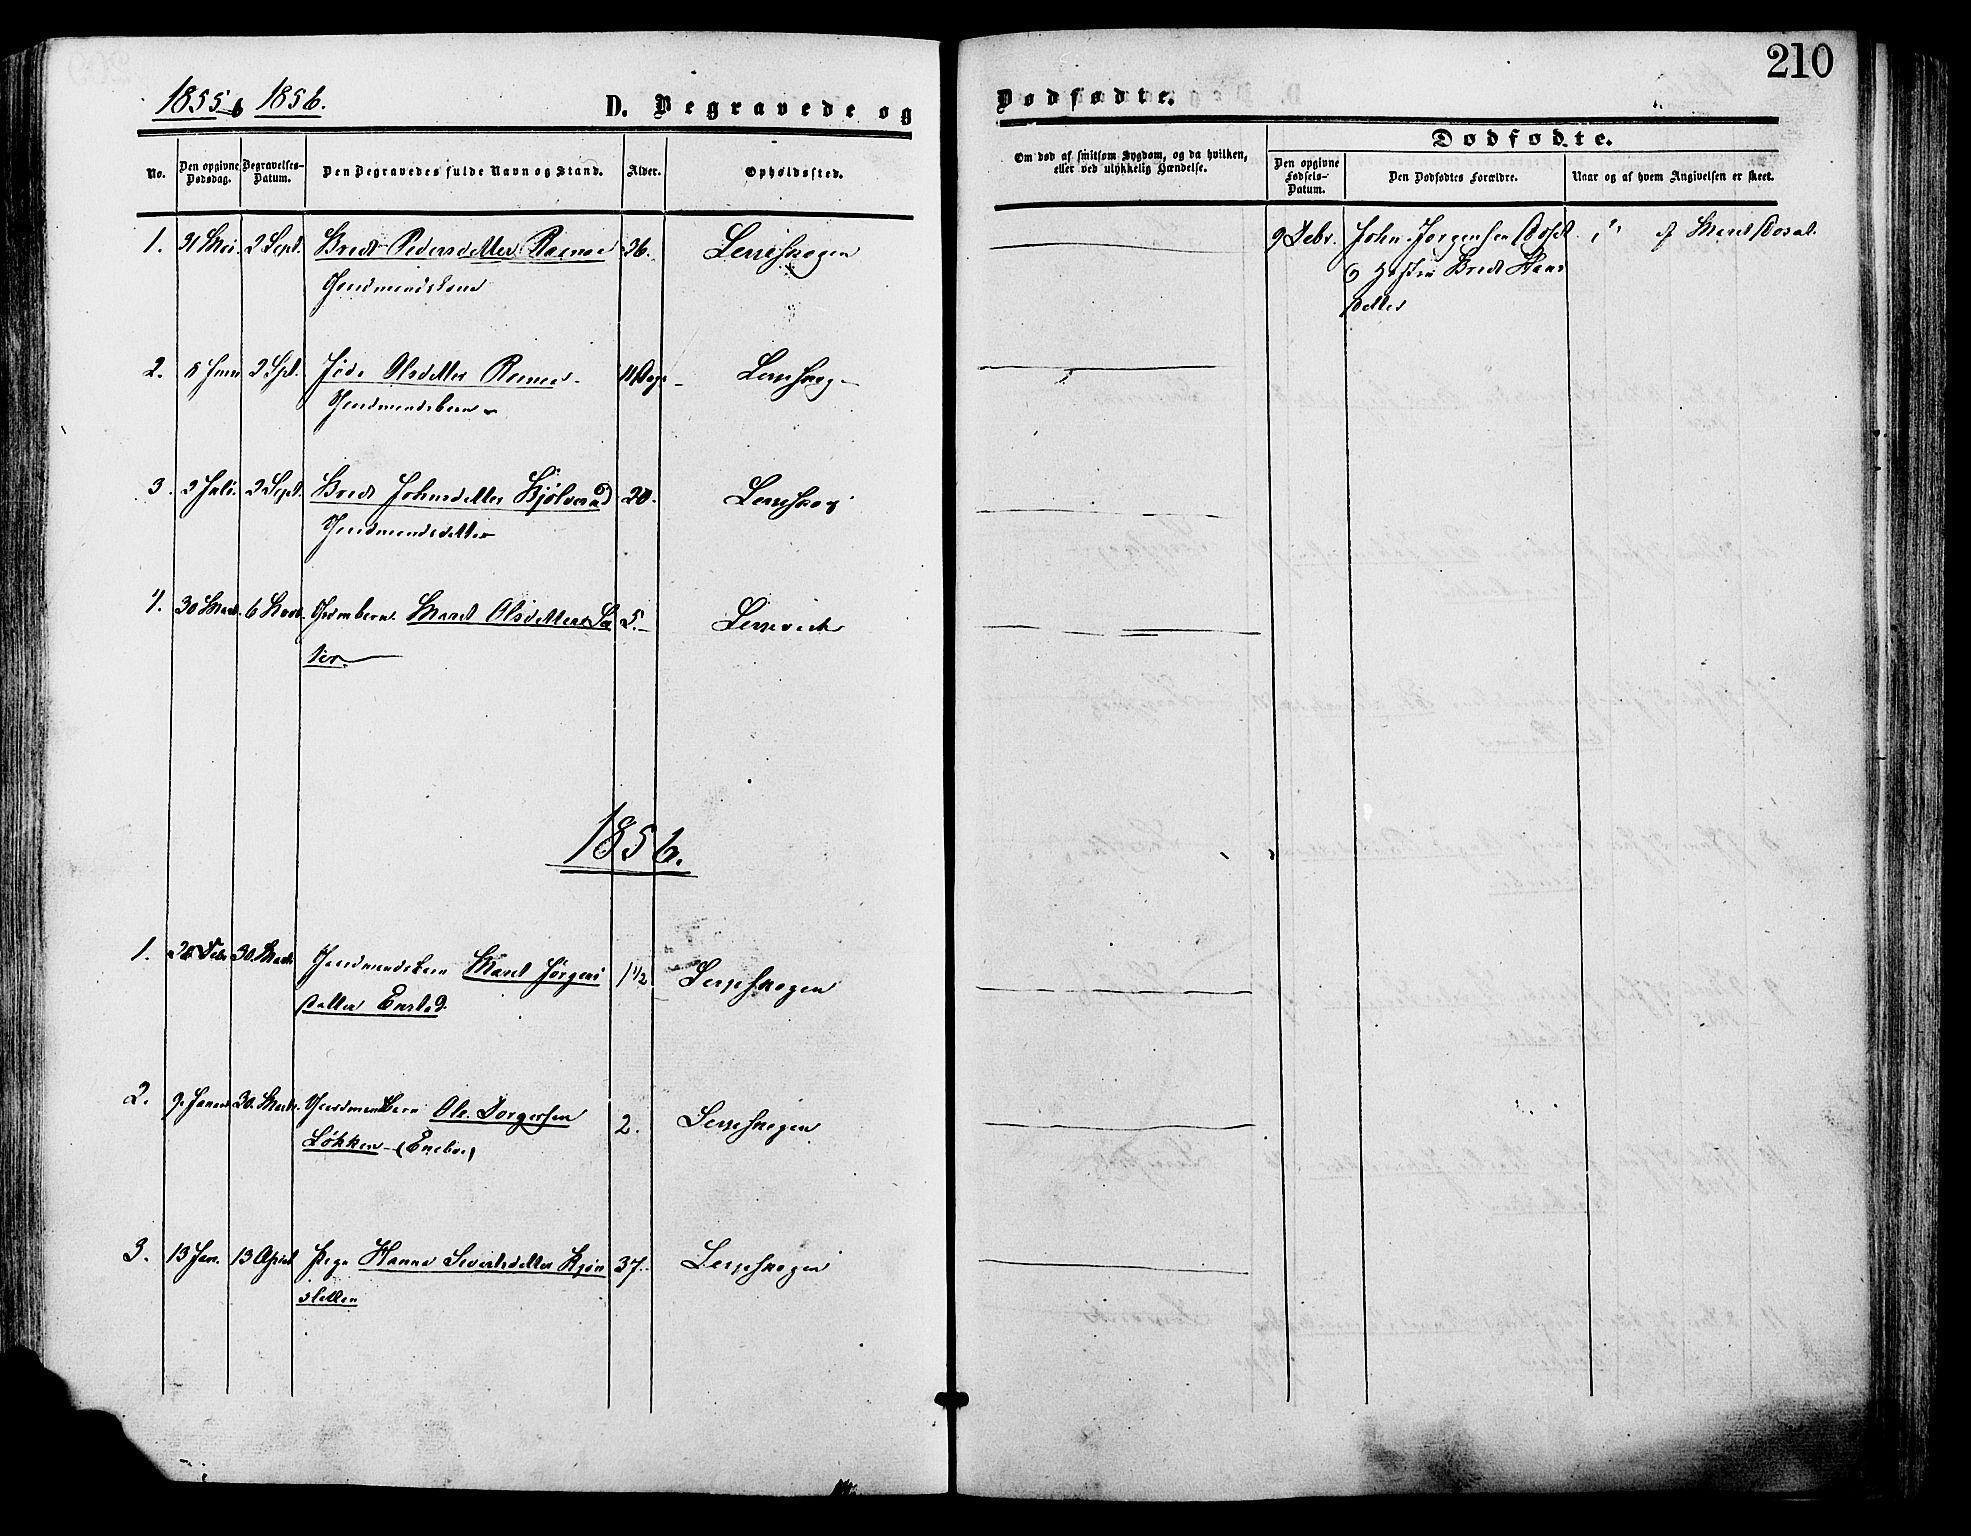 SAH, Lesja prestekontor, Parish register (official) no. 9, 1854-1889, p. 210